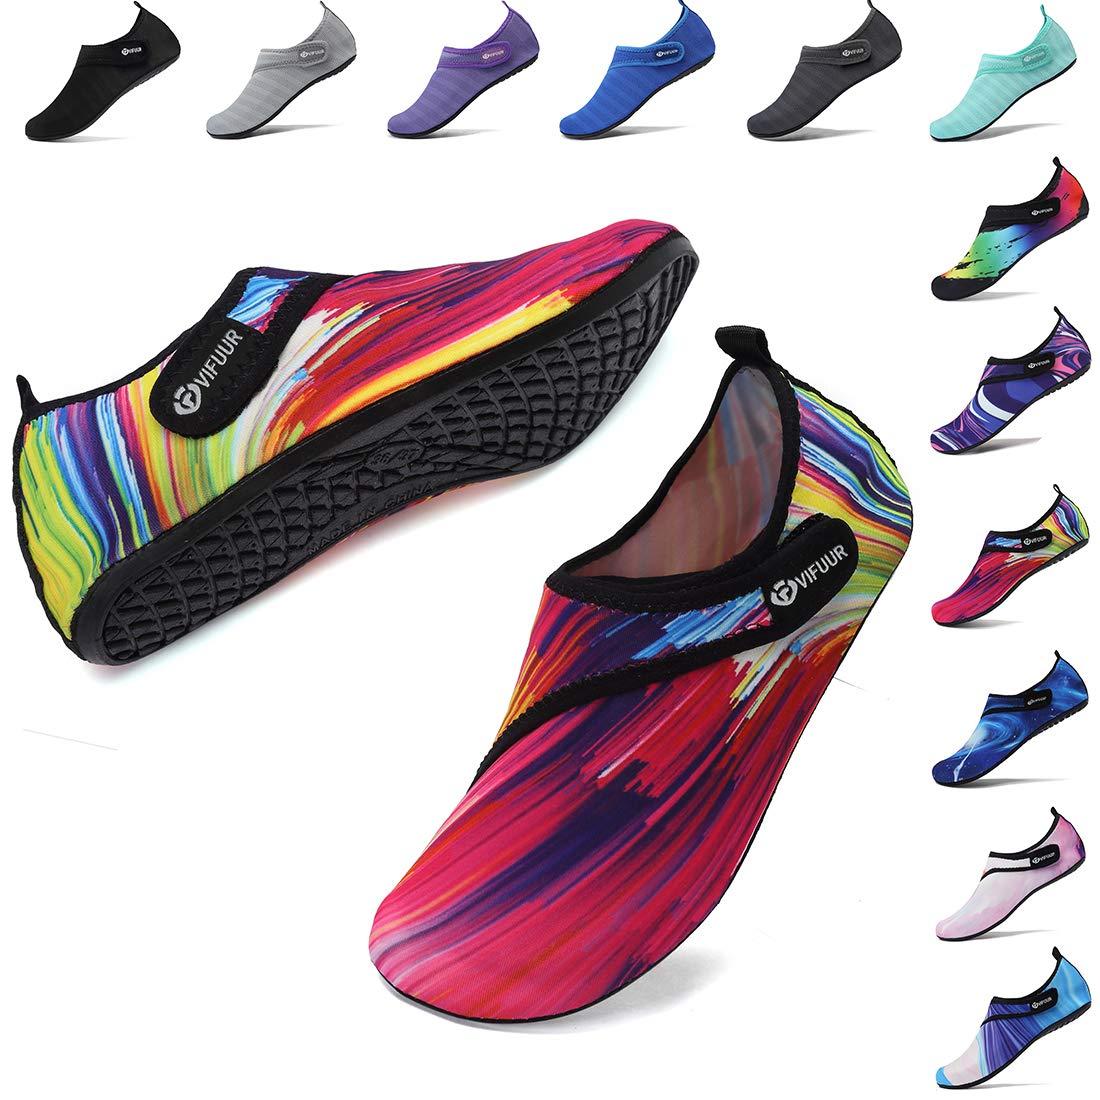 VIFUUR Womens Mens Water Shoes Adjustable Mesh Aqua Socks for Outdoor Swimming Beach Surfing